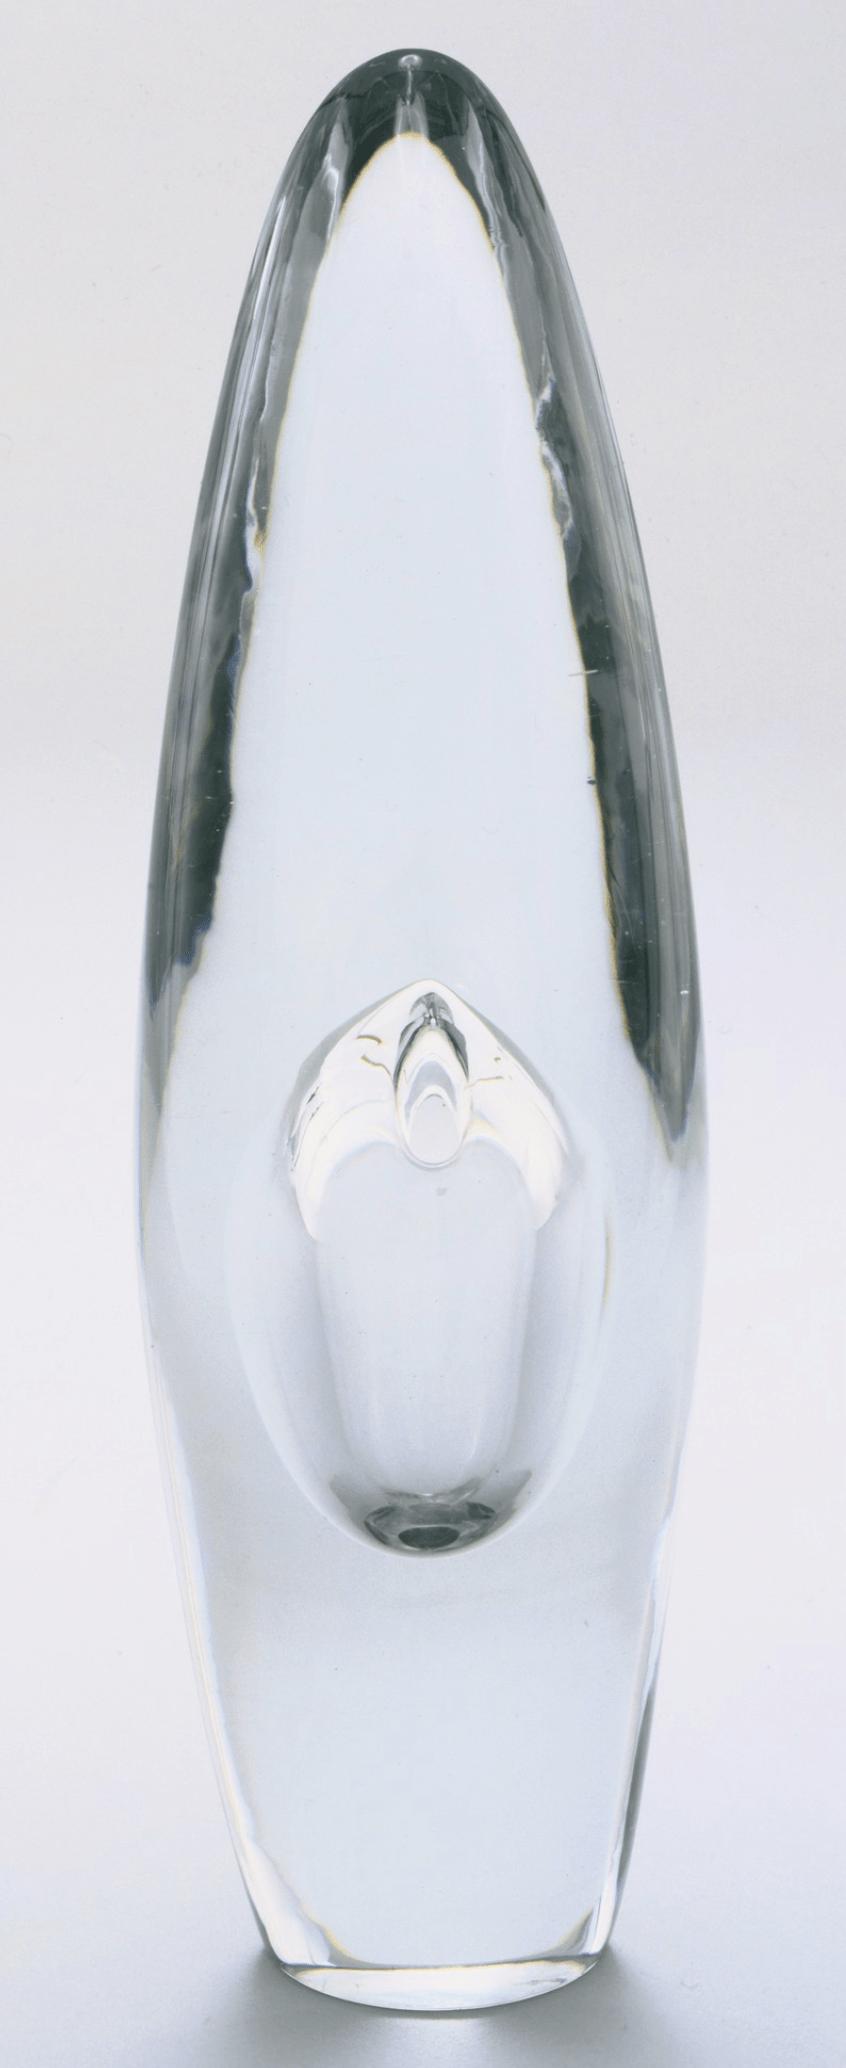 Orchid Bud Vase, c.1953 designed by Timo Sarpaneva